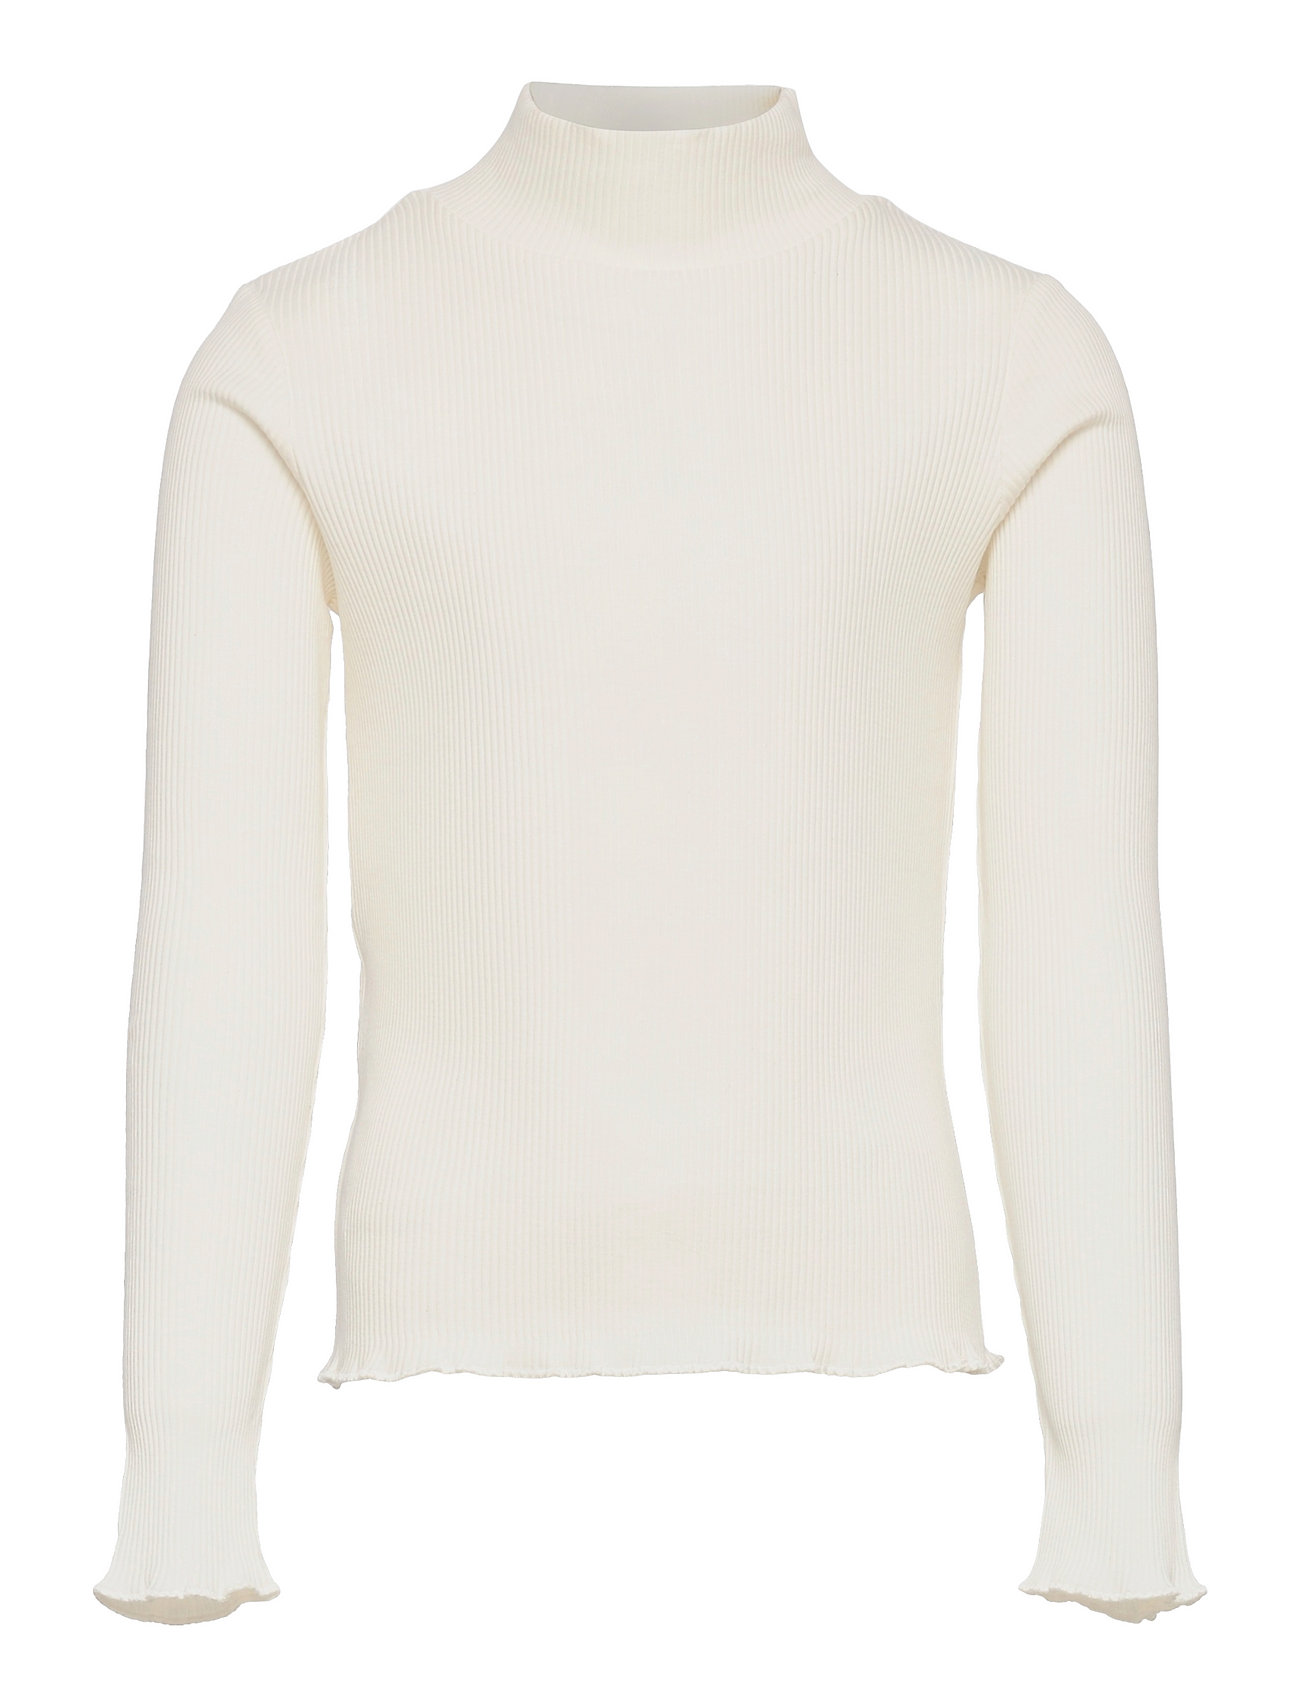 Turborib Langærmet T-shirt Hvid Mango